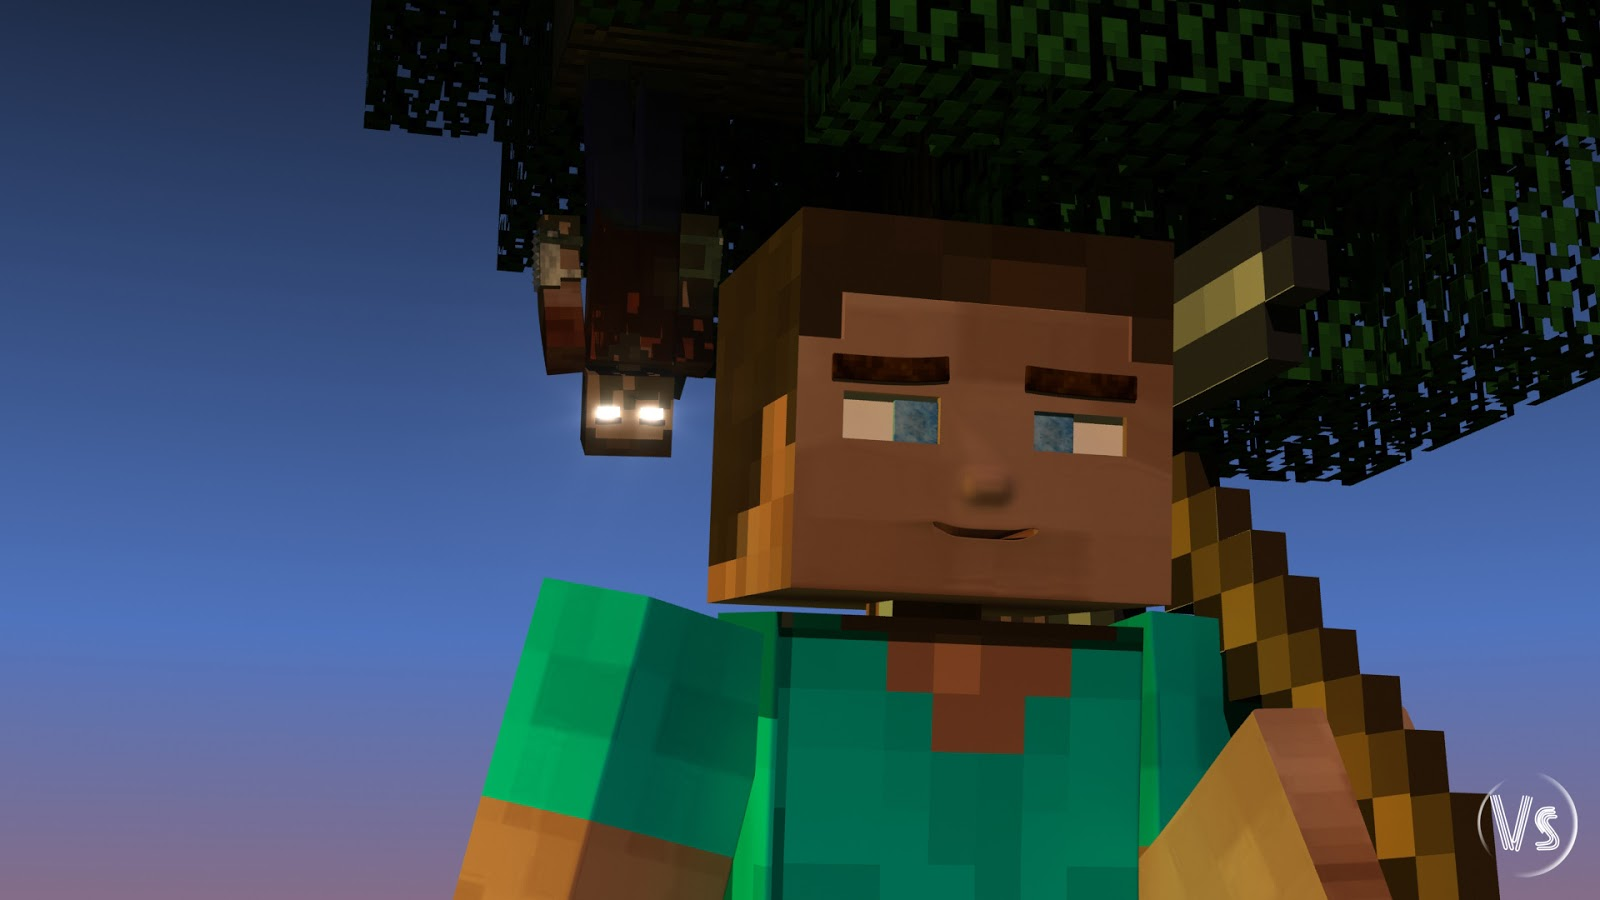 Minecraft Herobrine Vs Steve Wallpaper Herobrine � o assasino